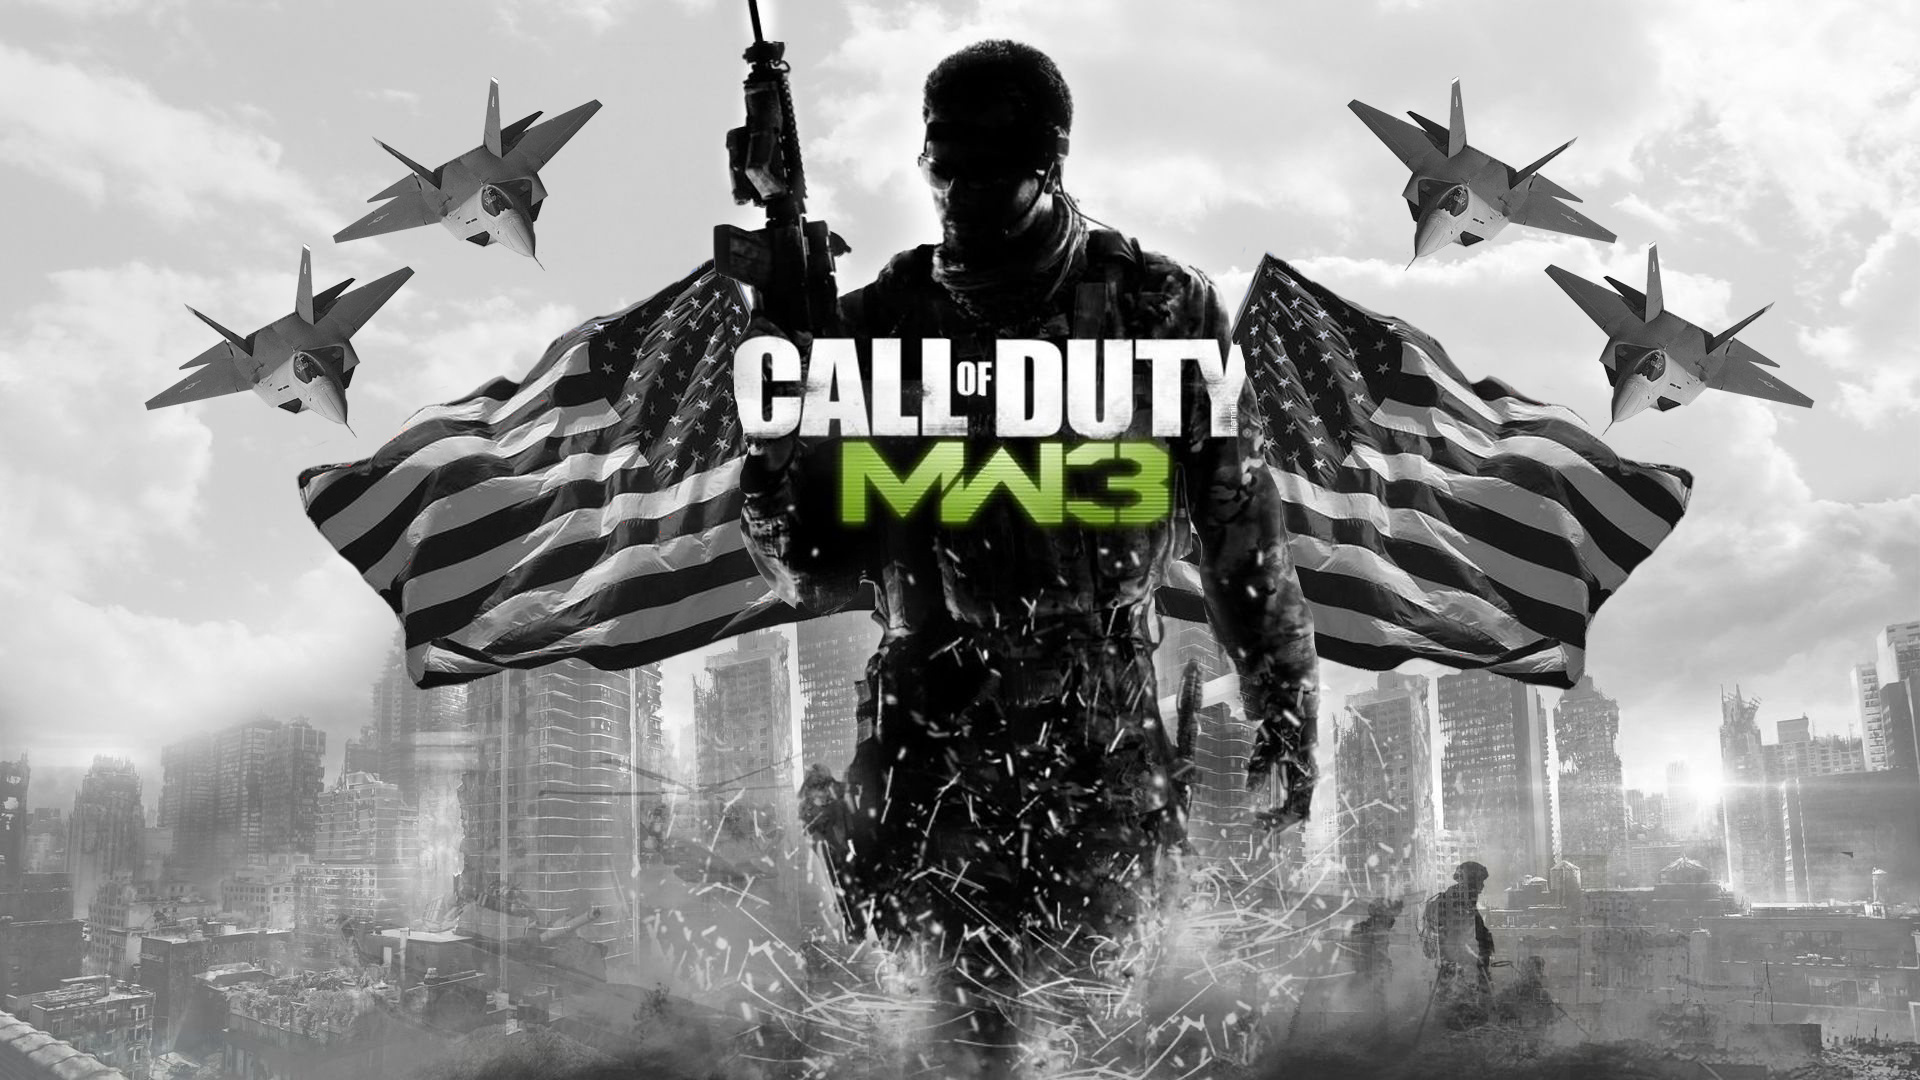 Call of Duty Modern Warfare 3 Wallpaper HD Game Wallpapers 1920x1080